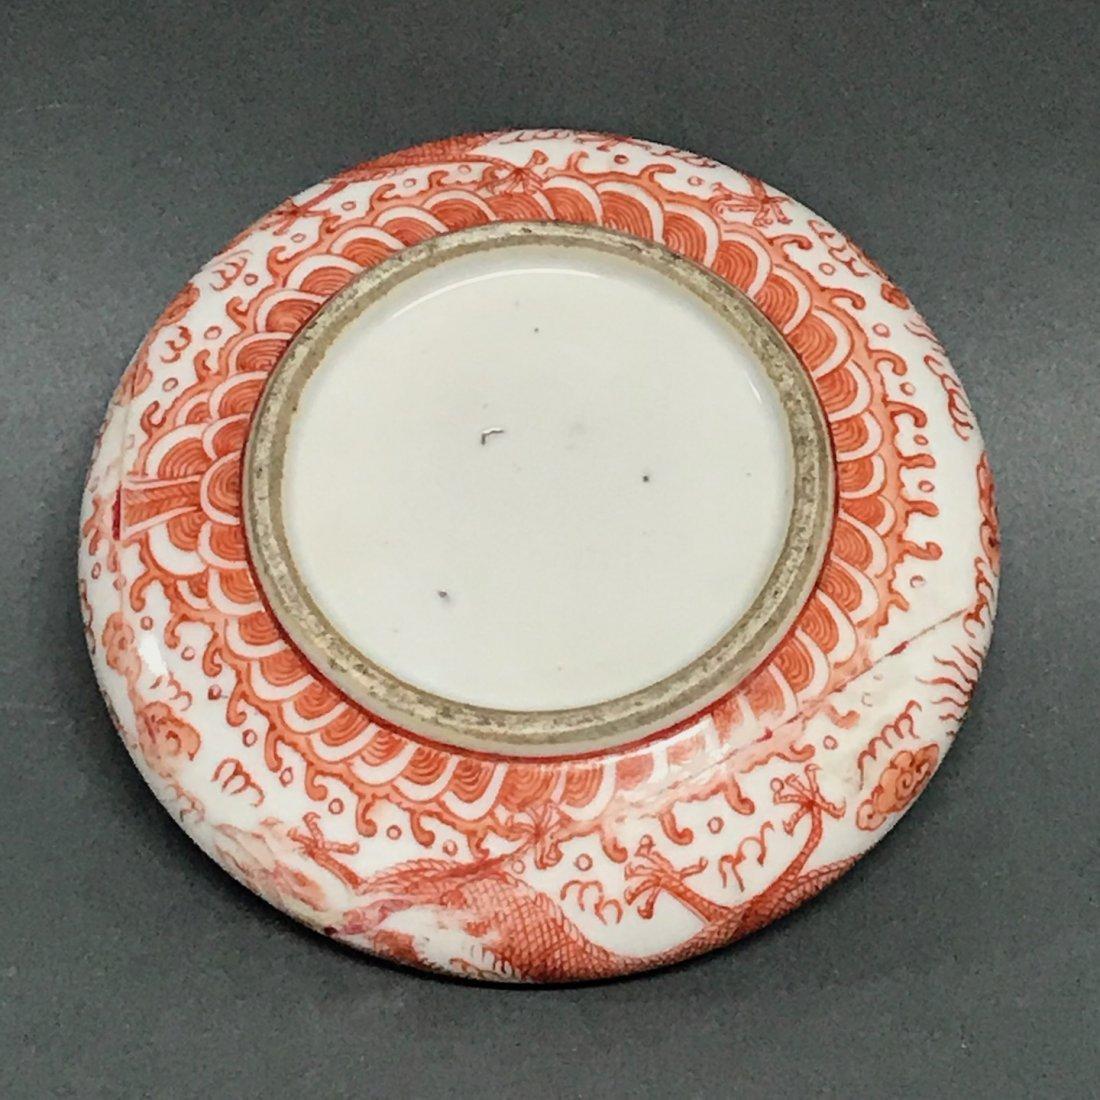 Chinese Porcelain Famille Rose Brush Washer - 6